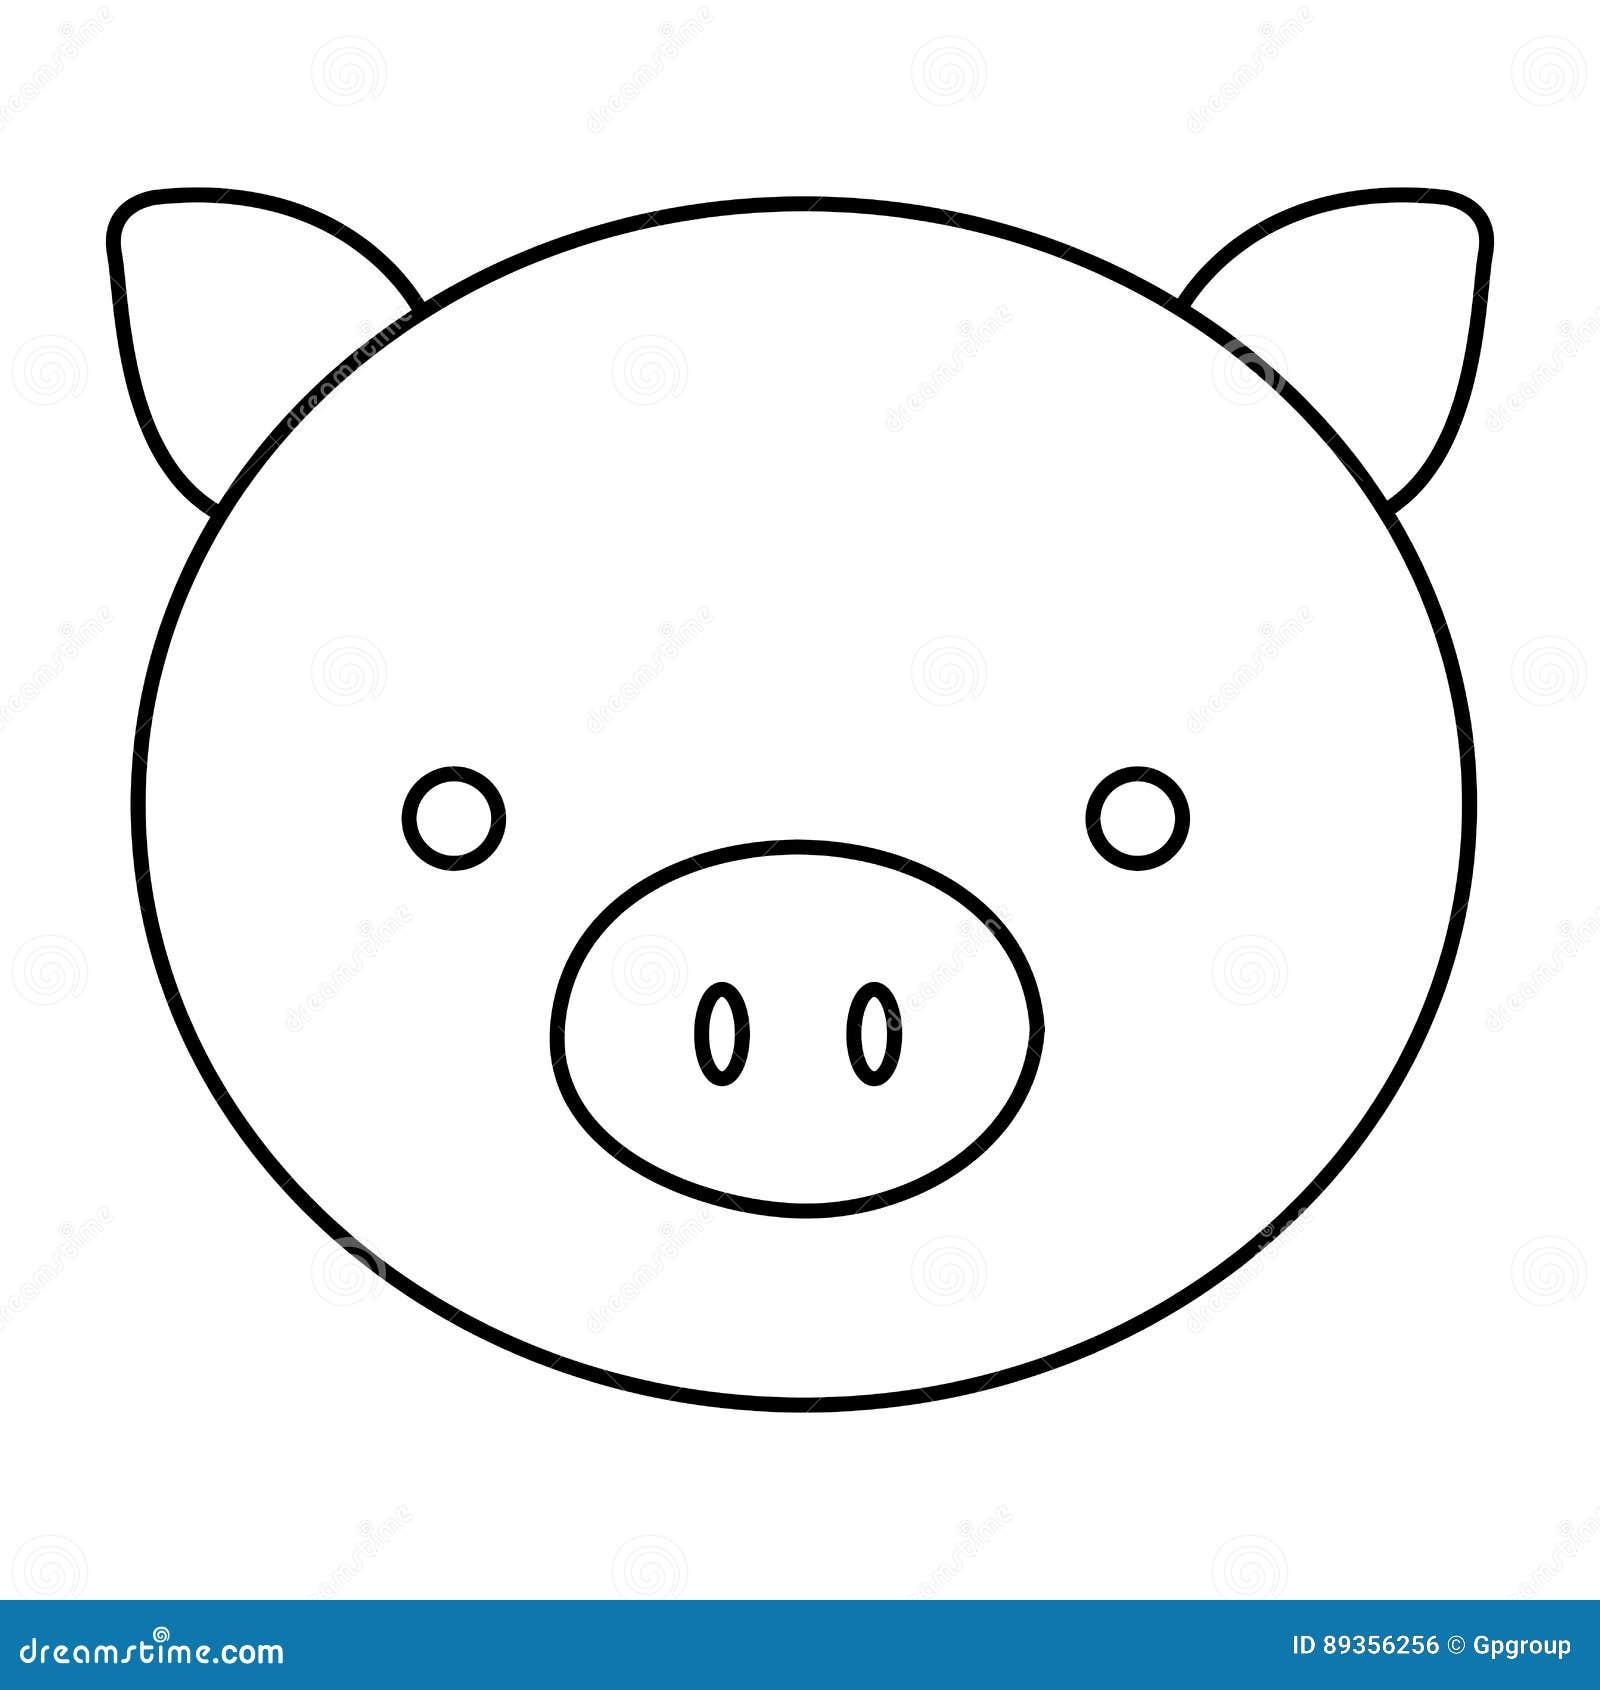 Fantástico Lindo Cerdo Para Colorear Composición - Dibujos de ...